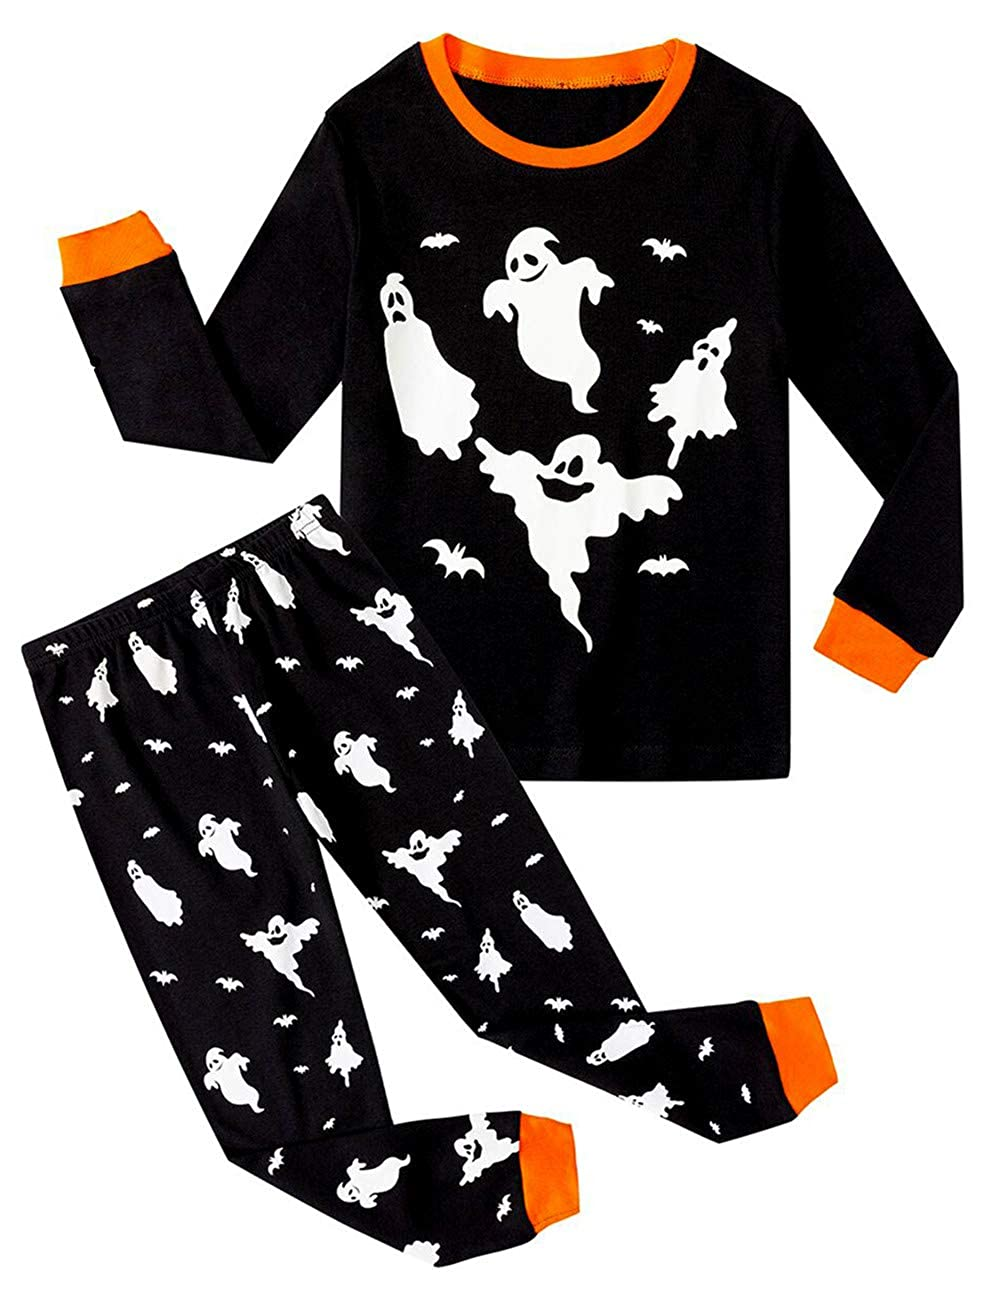 Boys Pyjamas Set 100% Cotton Kids Long Sleeves Shirts Pants Pjs Nightwear Pumpkin Ghost Halloween Party Costumes for Toddler Children BB814